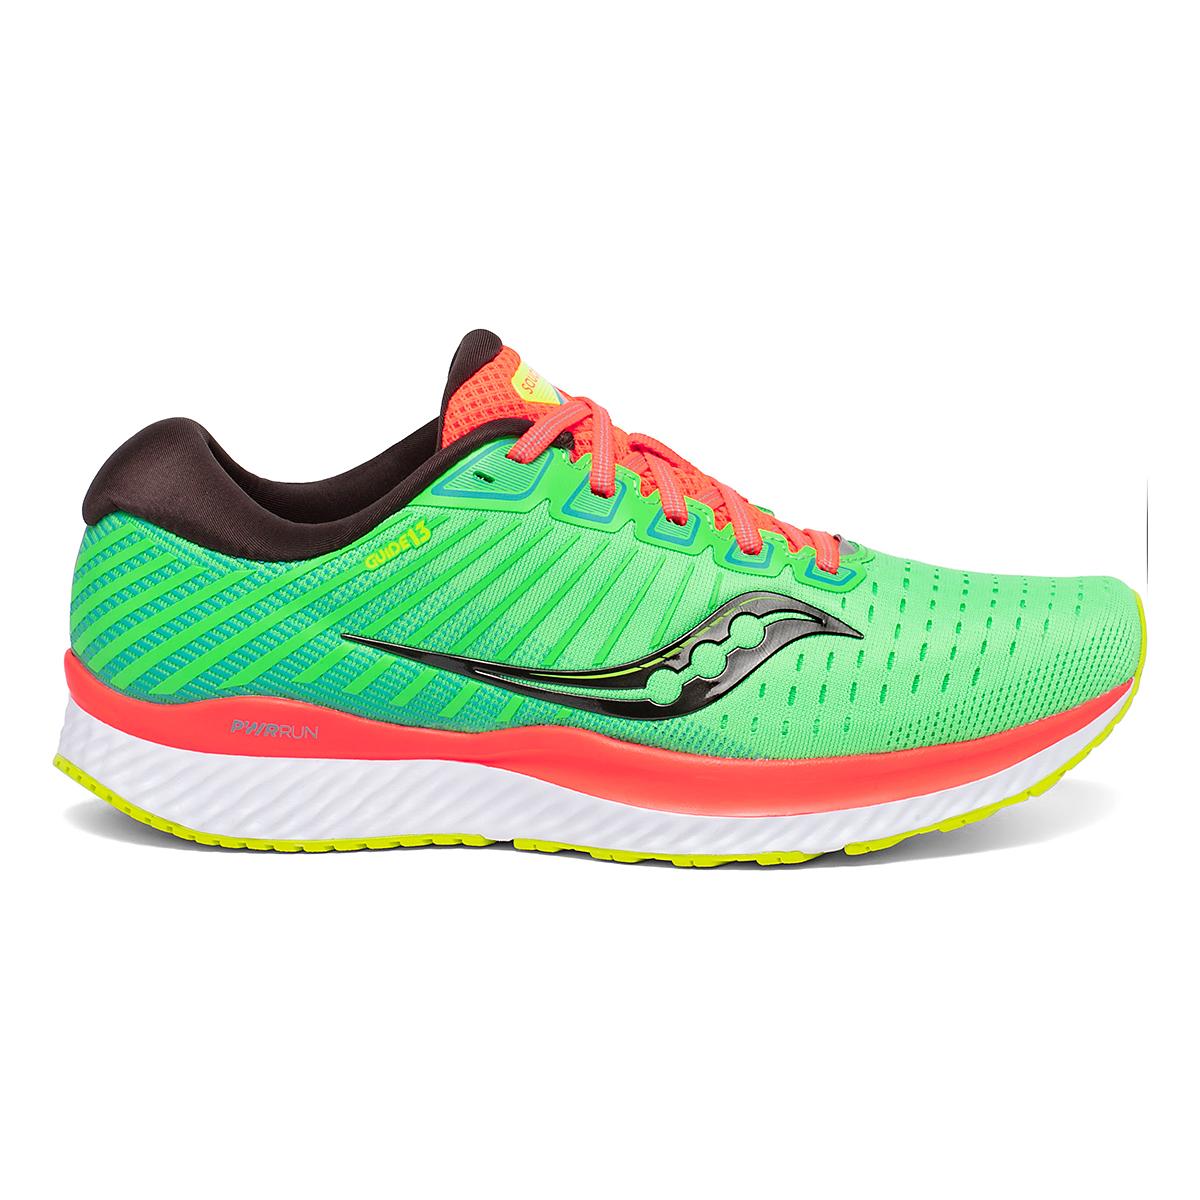 Men's Saucony Guide 13 Running Shoe - Color: Green Mutant - Size: 7 - Width: Regular, Green Mutant, large, image 1